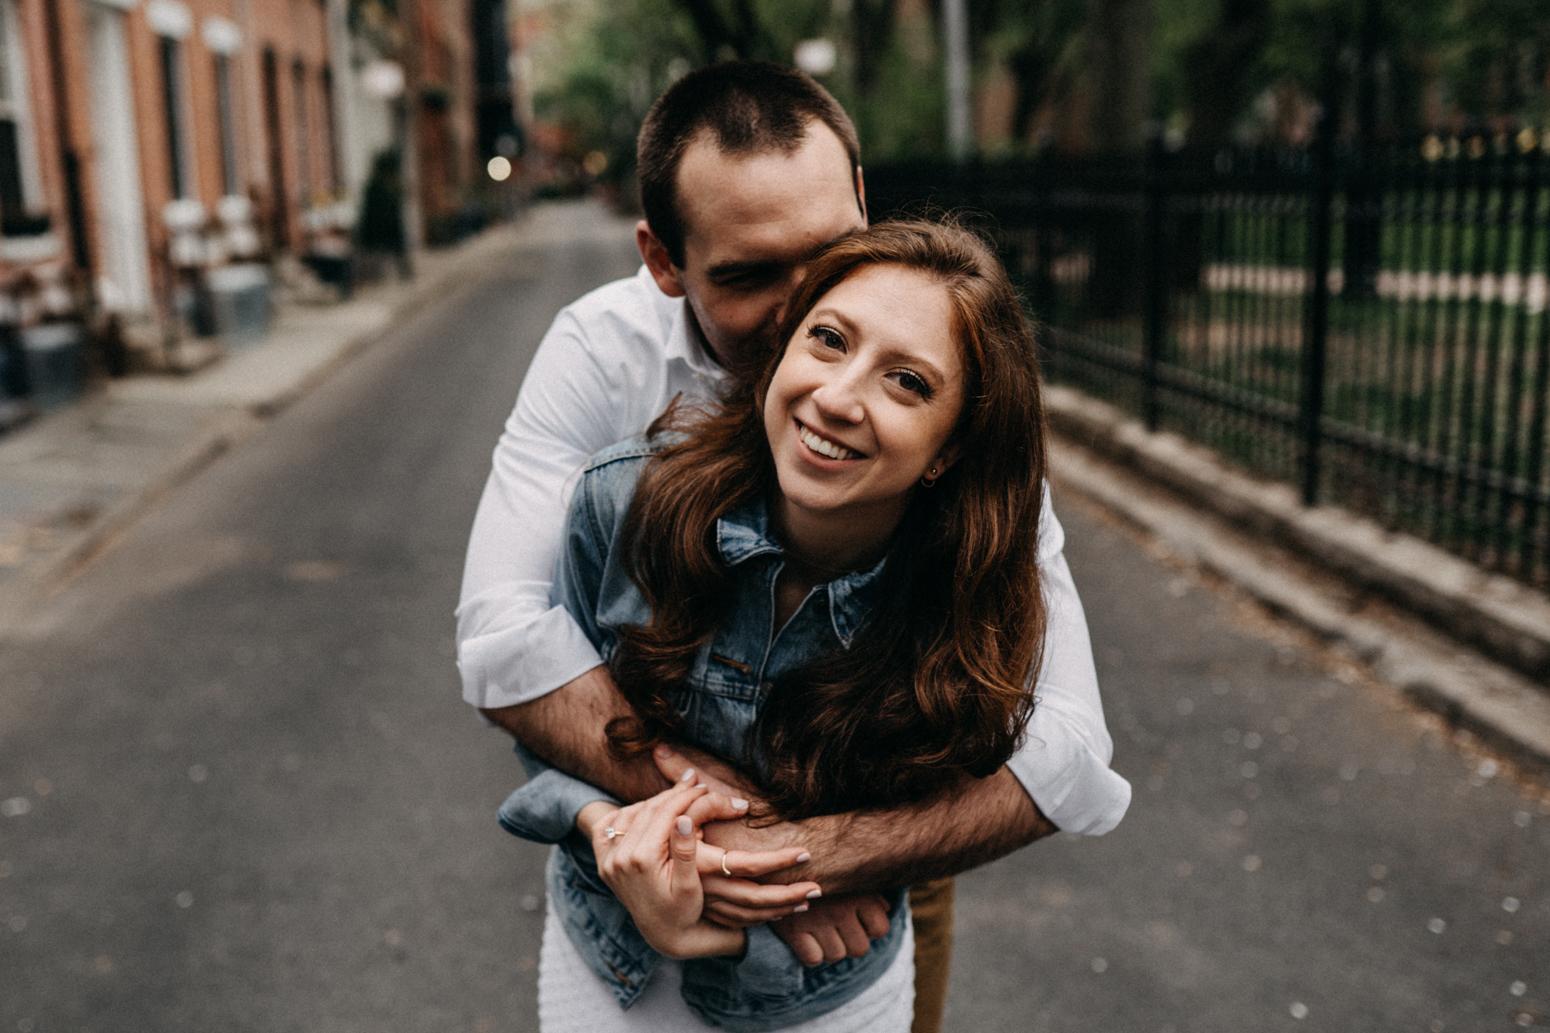 New York City Wedding Photographer (49 of 59).JPG